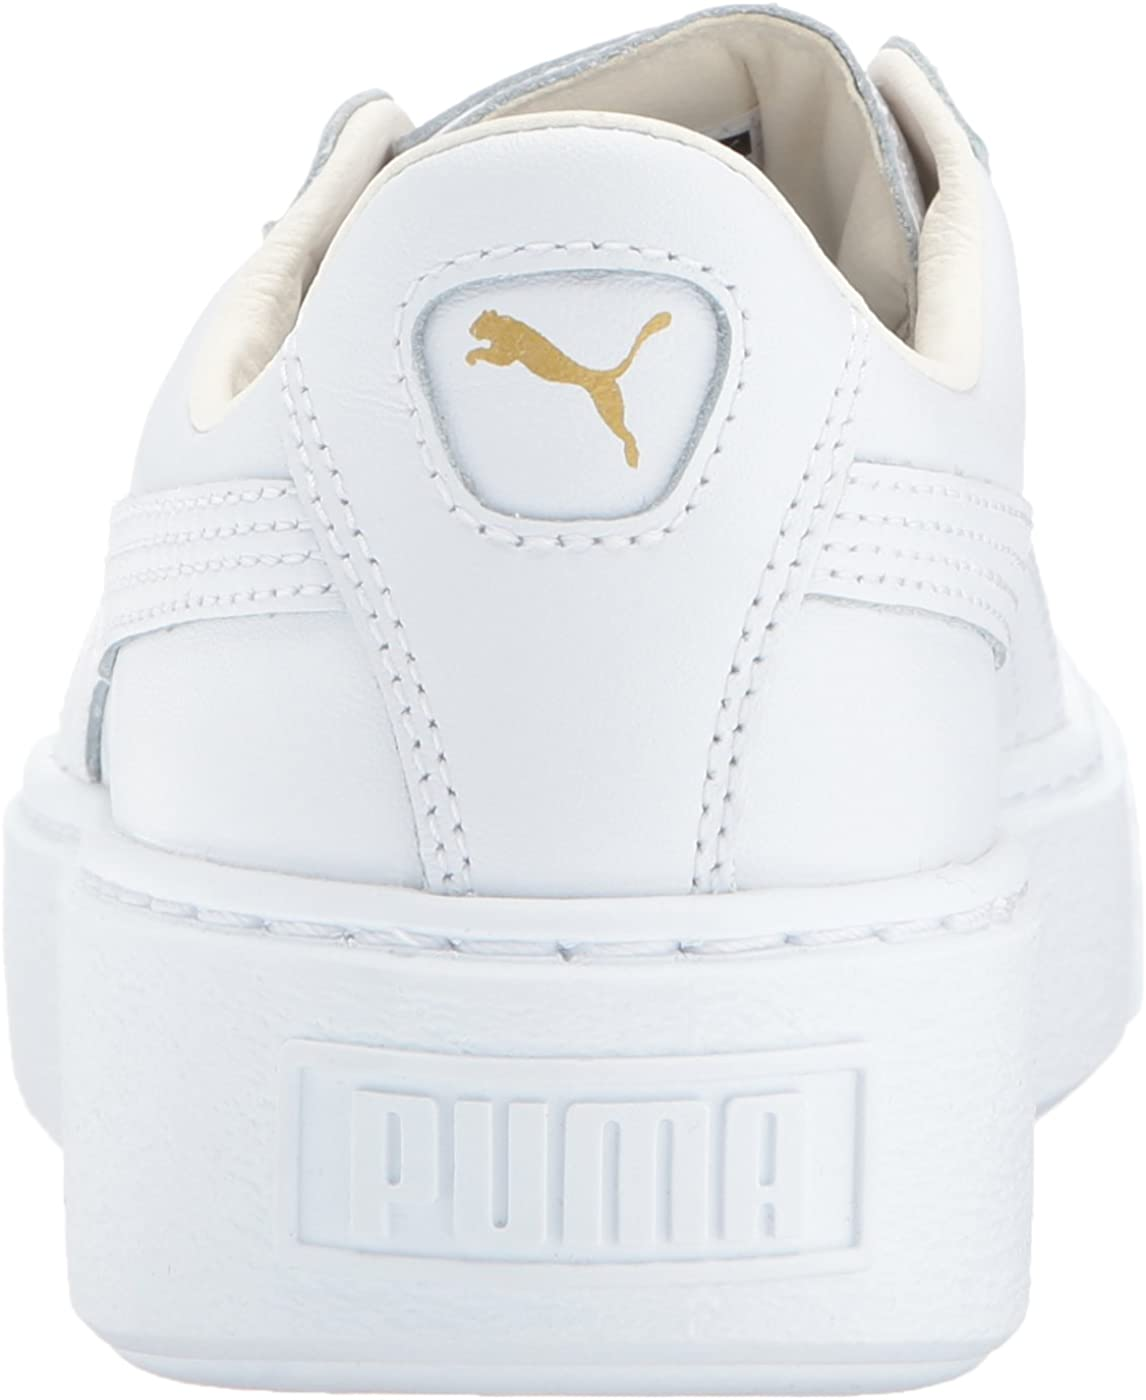 puma basket platform core white gold